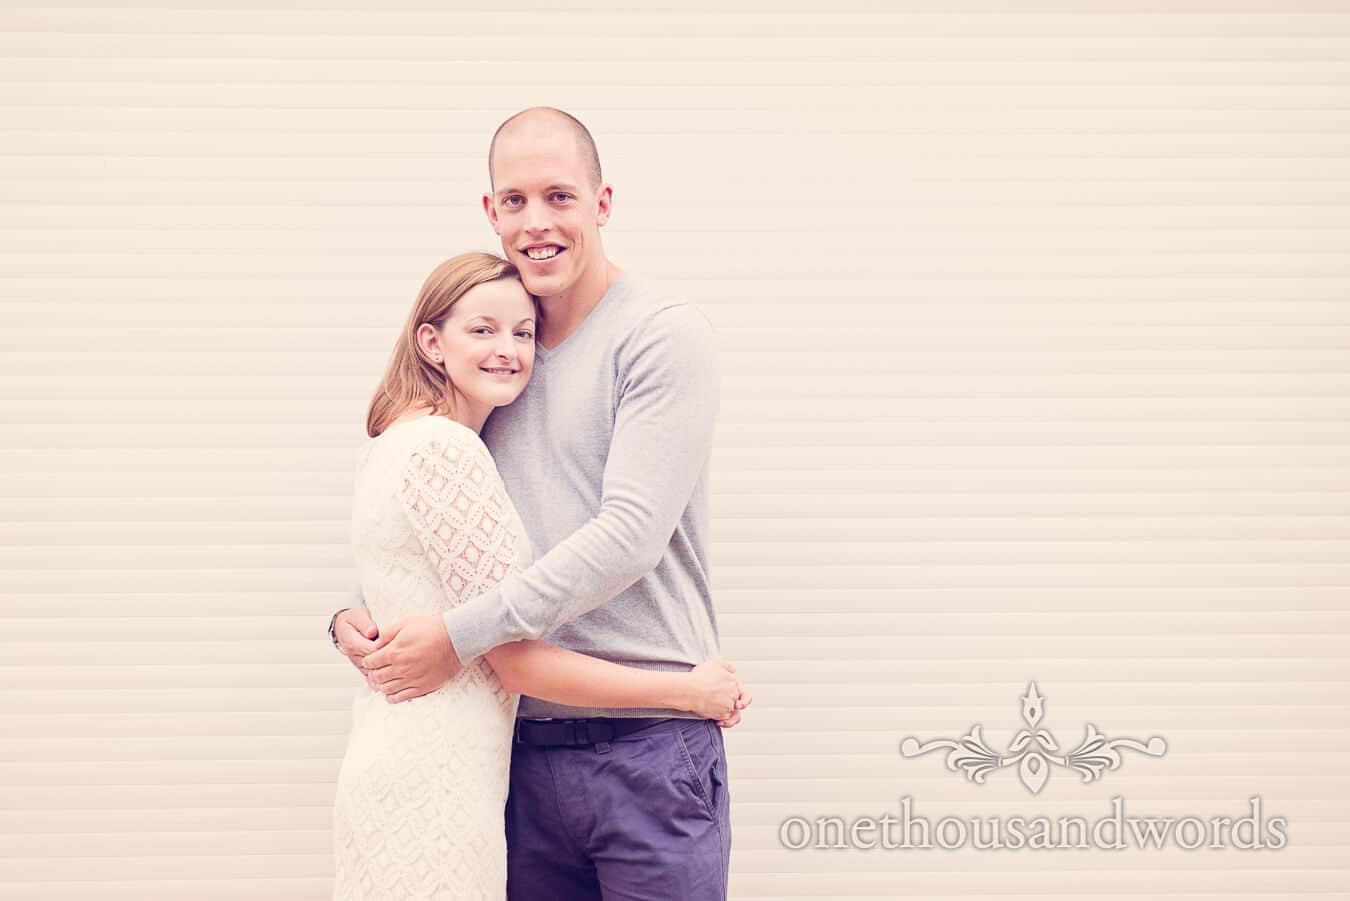 Sandbanks Hotel Engagement Photograph of wedding couple hugging